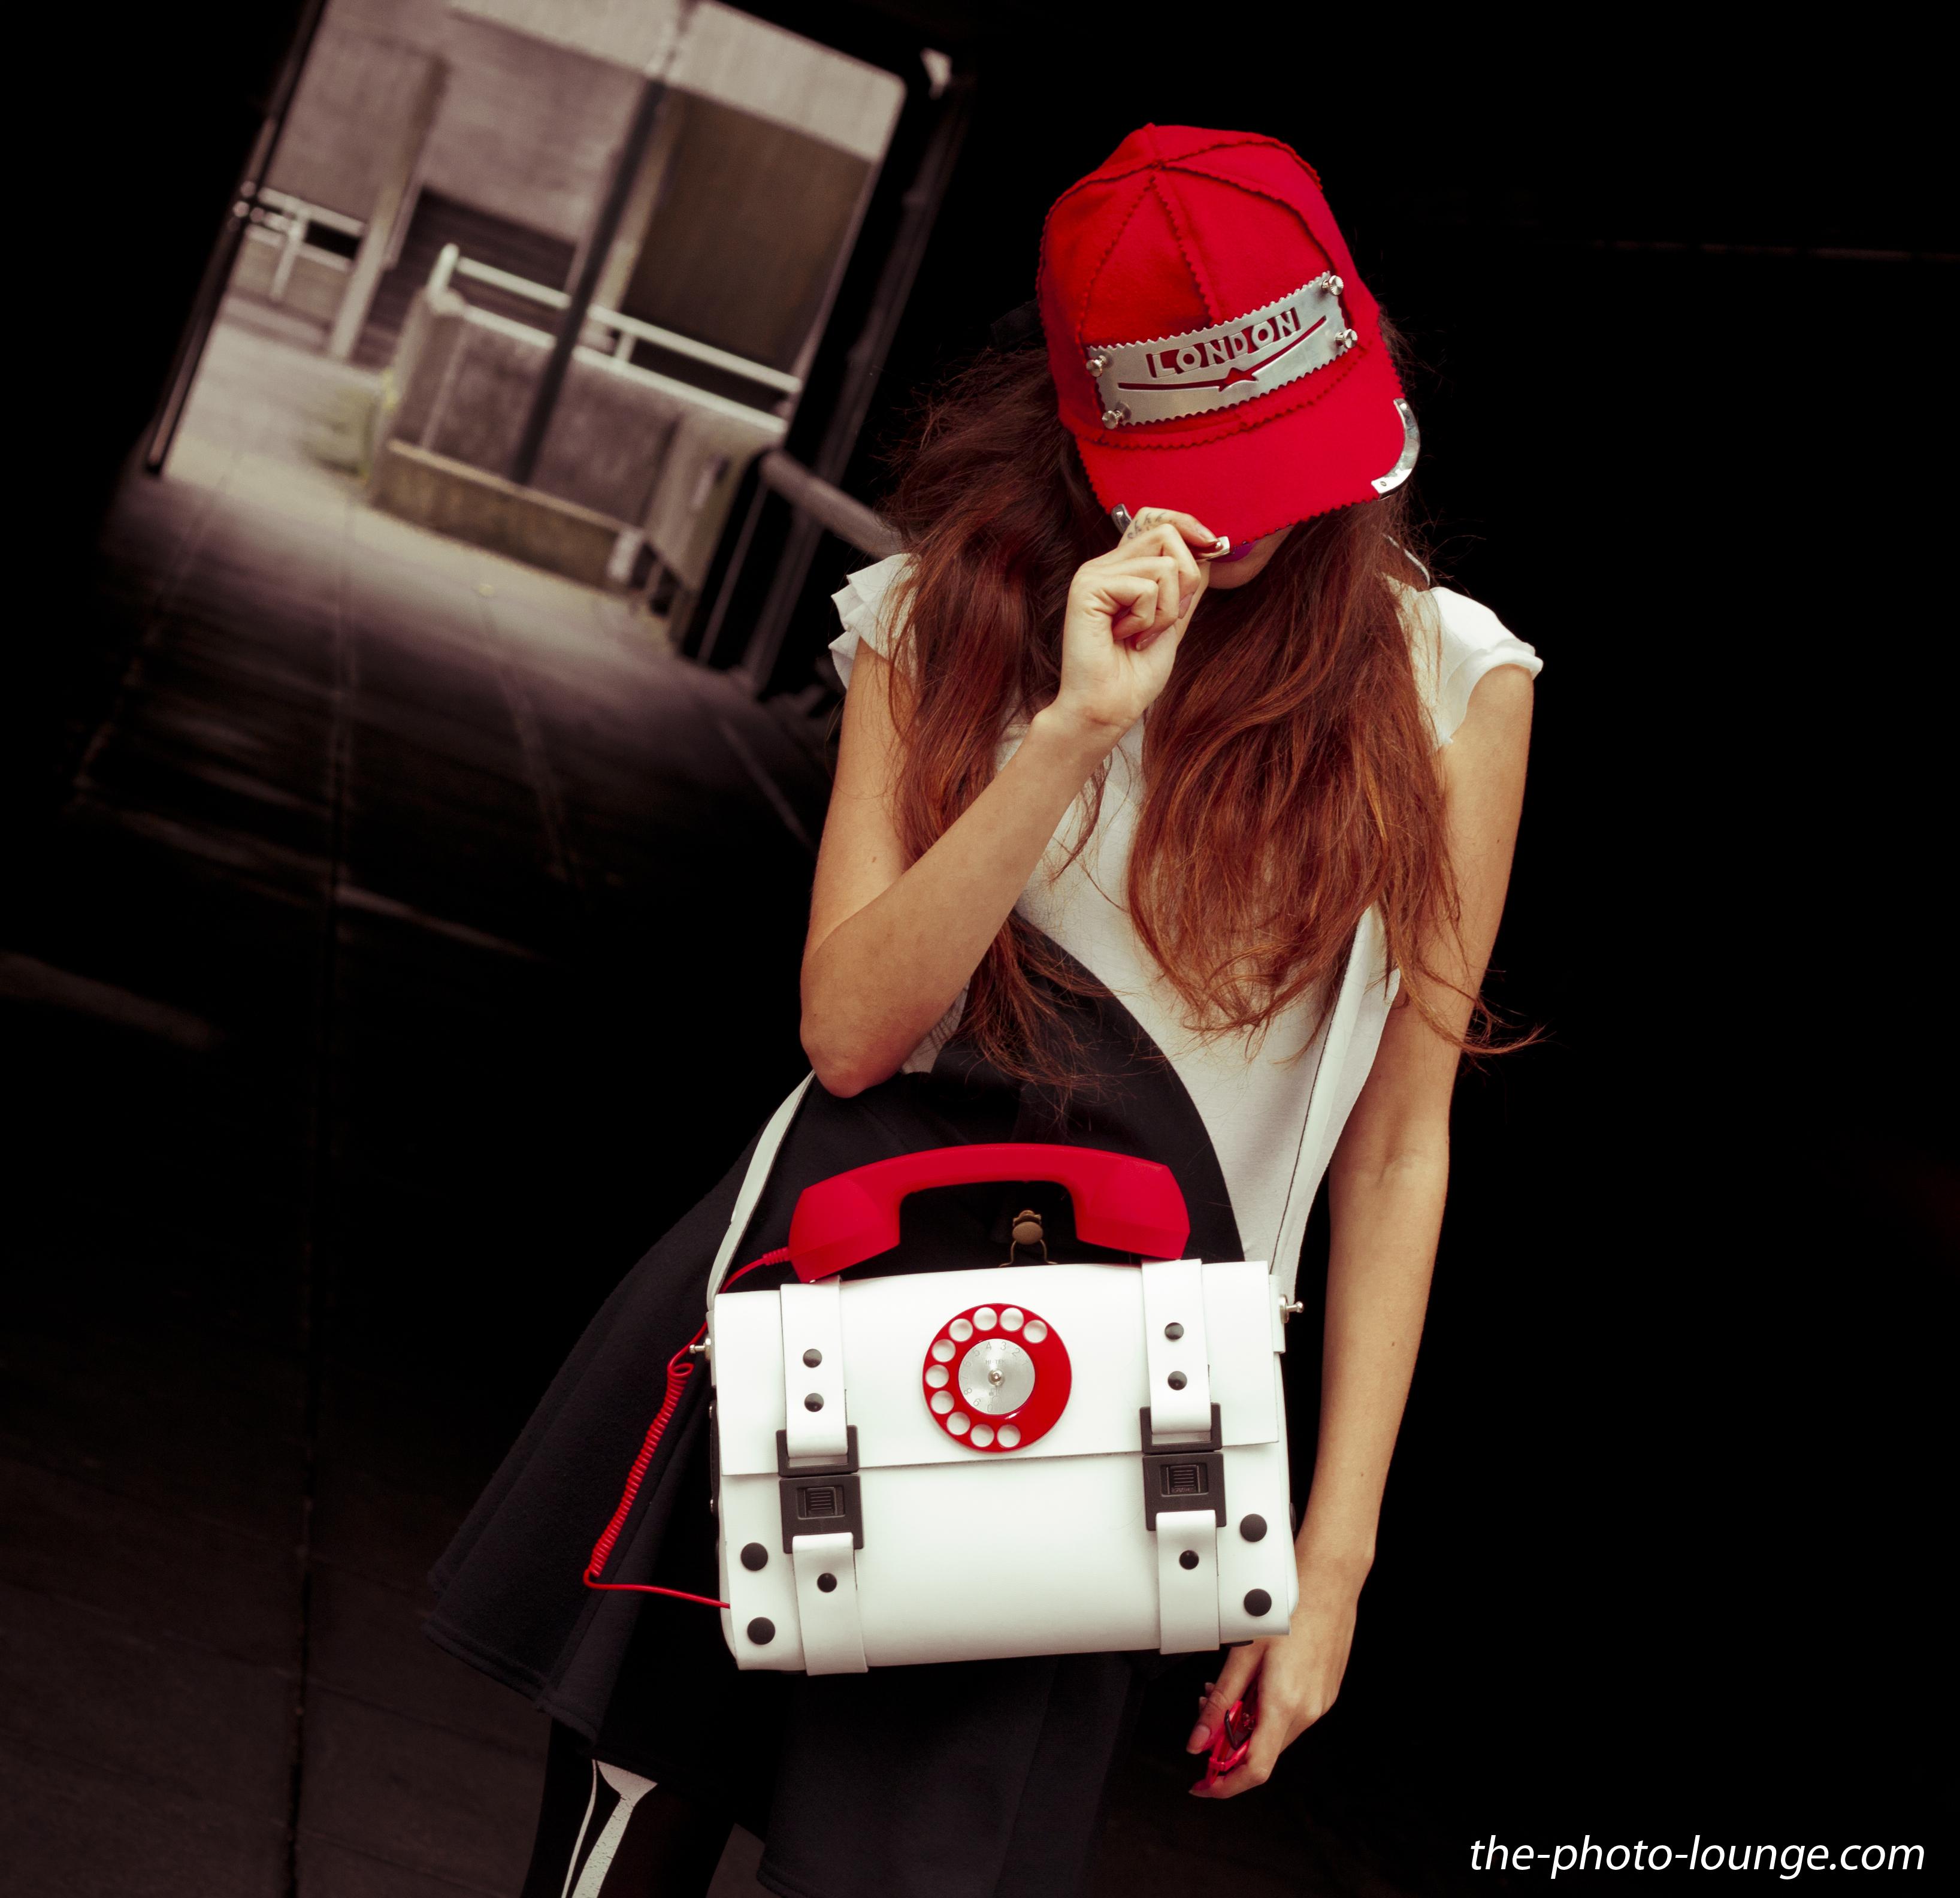 red_london_wool_baseball_cap_hats_and_caps_3.jpg